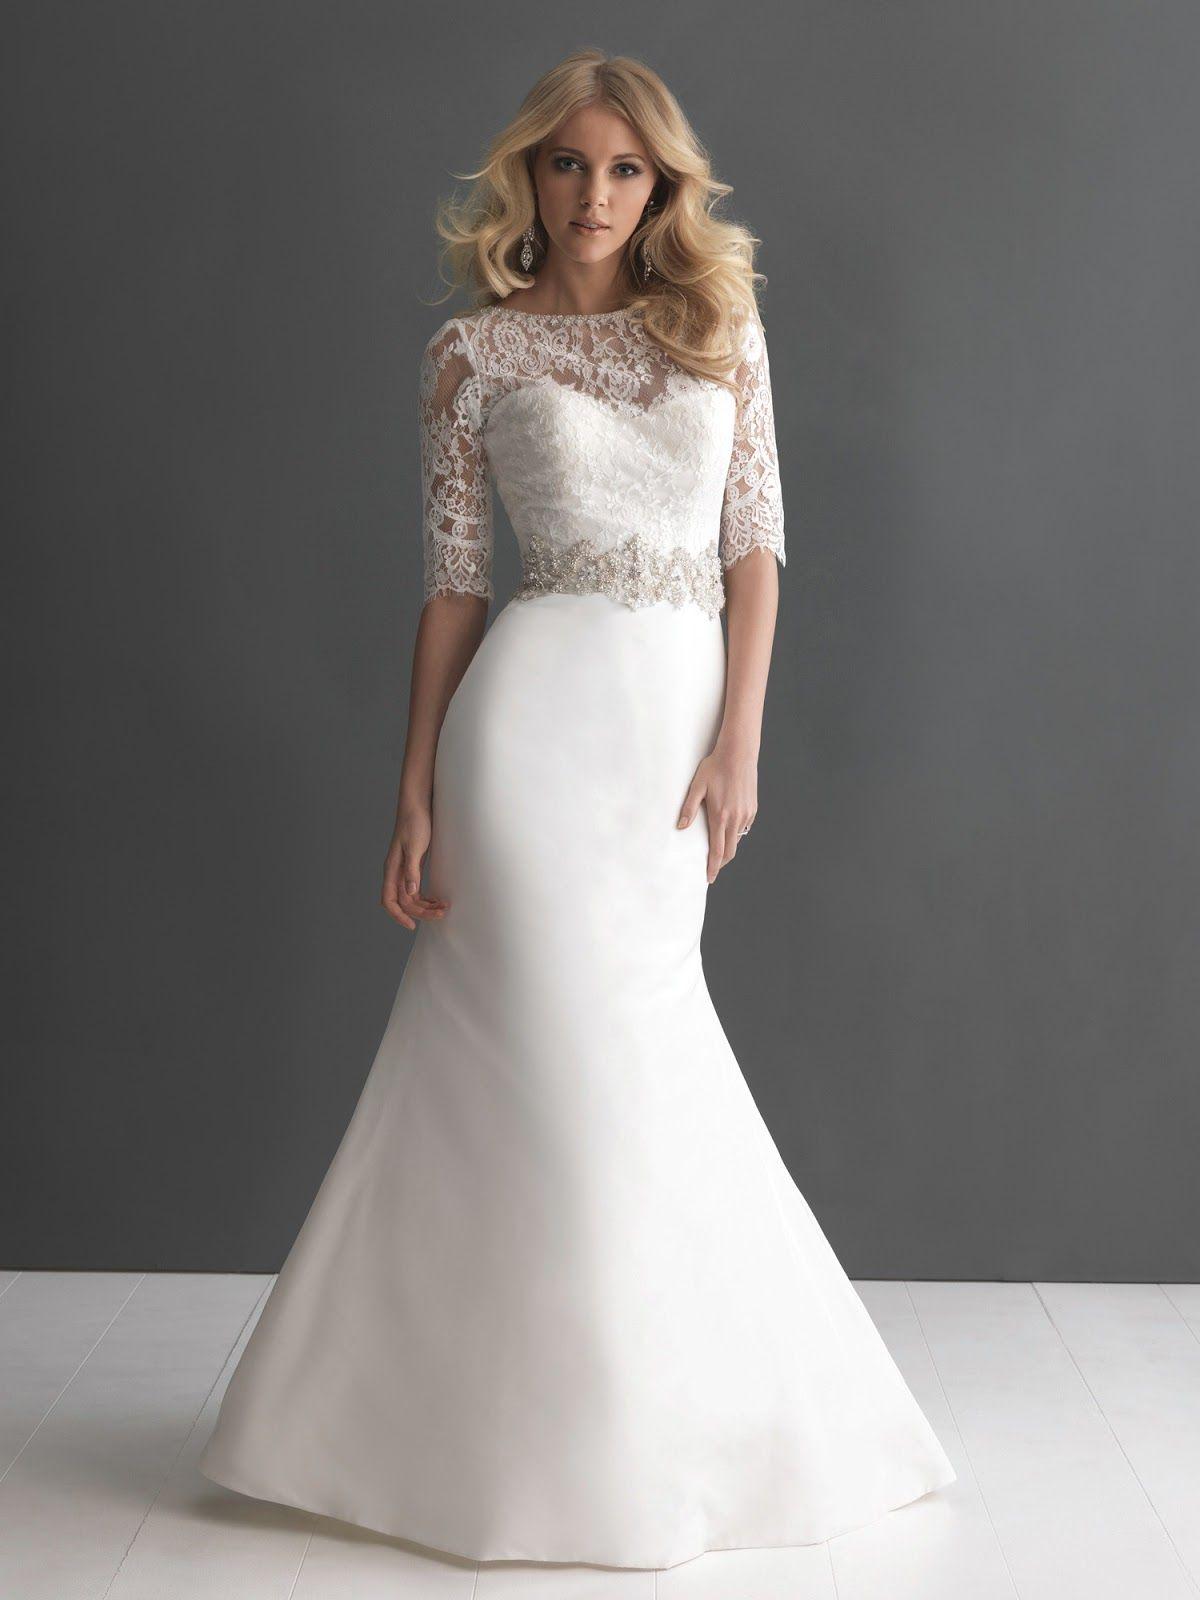 FALL WEDDING DRESS Necklines